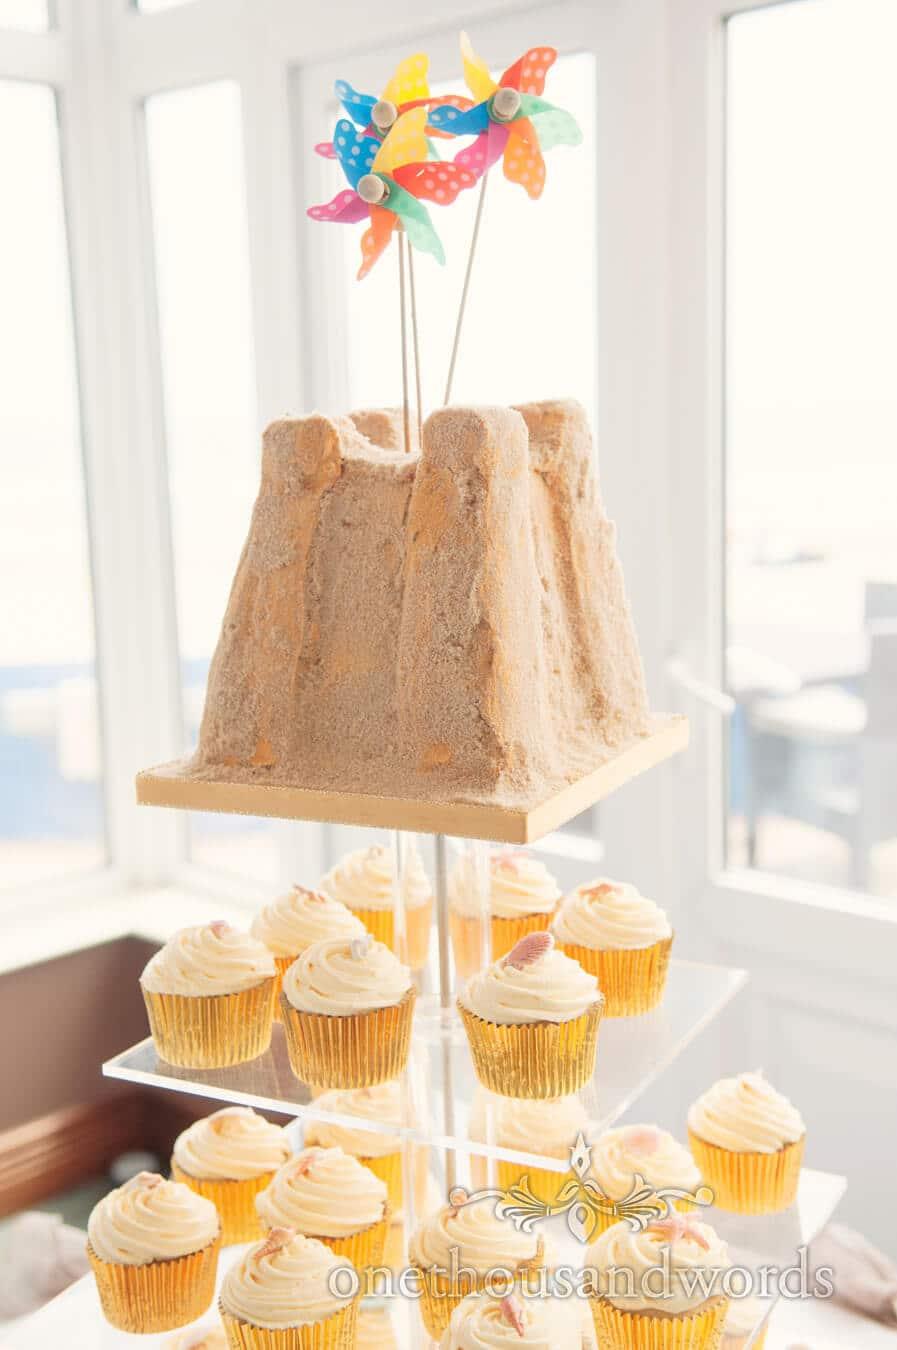 Sandcastle Wedding Cake with ice cream cupcakes